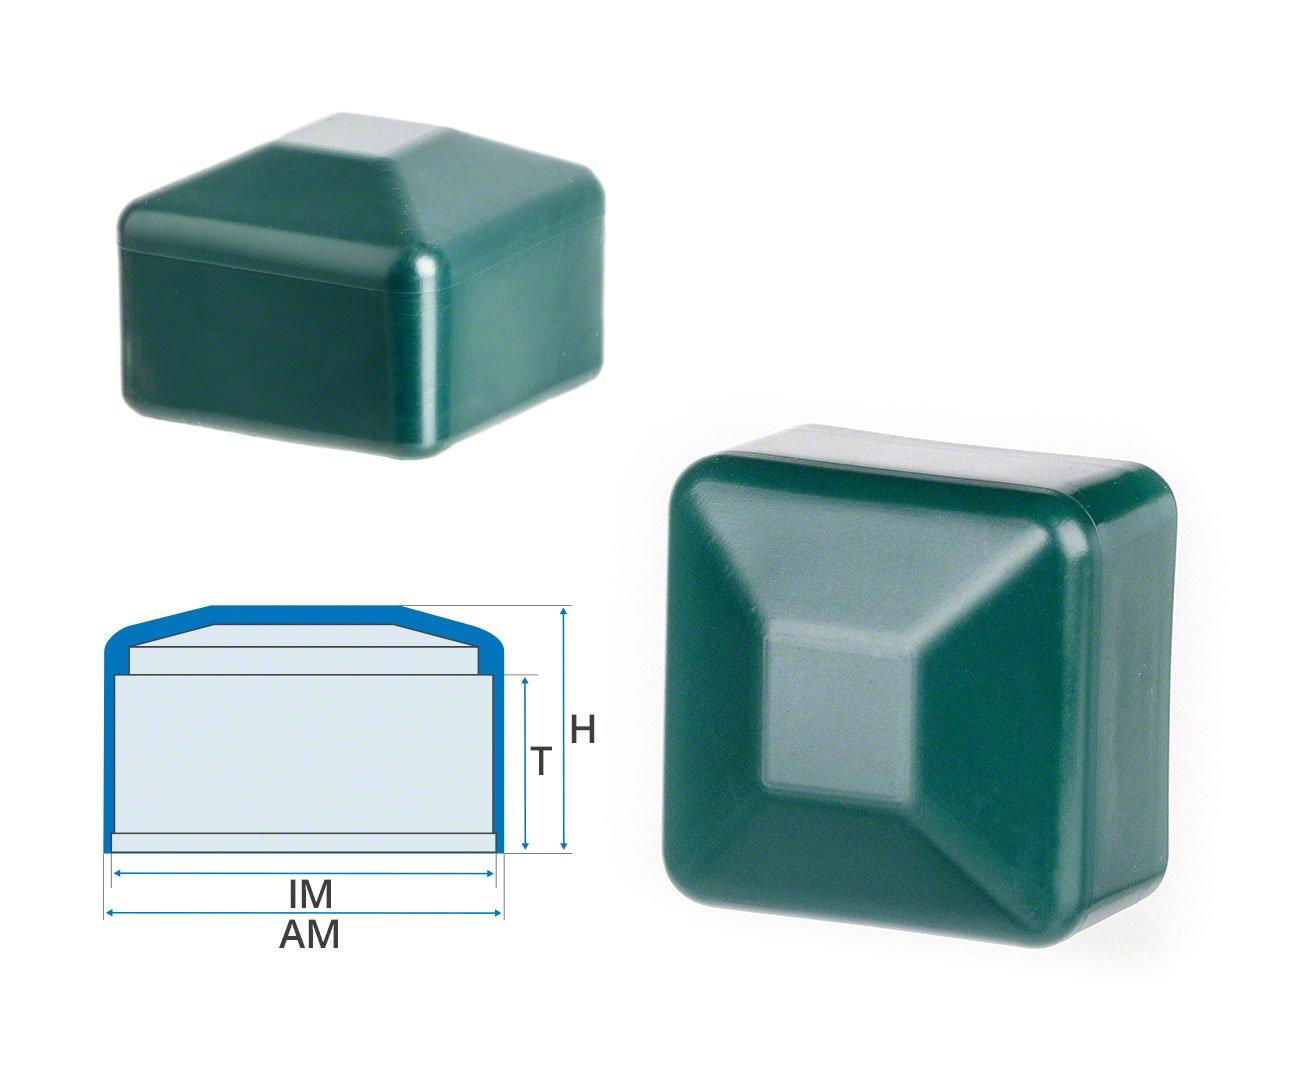 Zaunpfahlkappe quadratisch 60x60 mm Gr/ün Kunststoff Pfostenkappen Abdeckappen 10 Stck